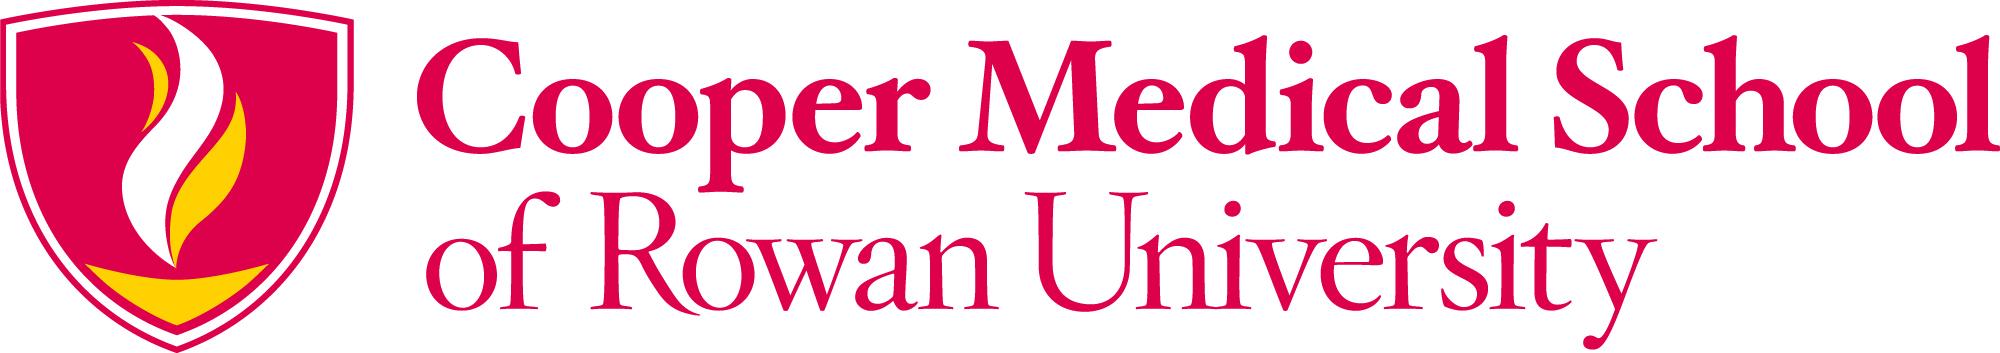 Cooper Medical School of Rowan University Interview Prep